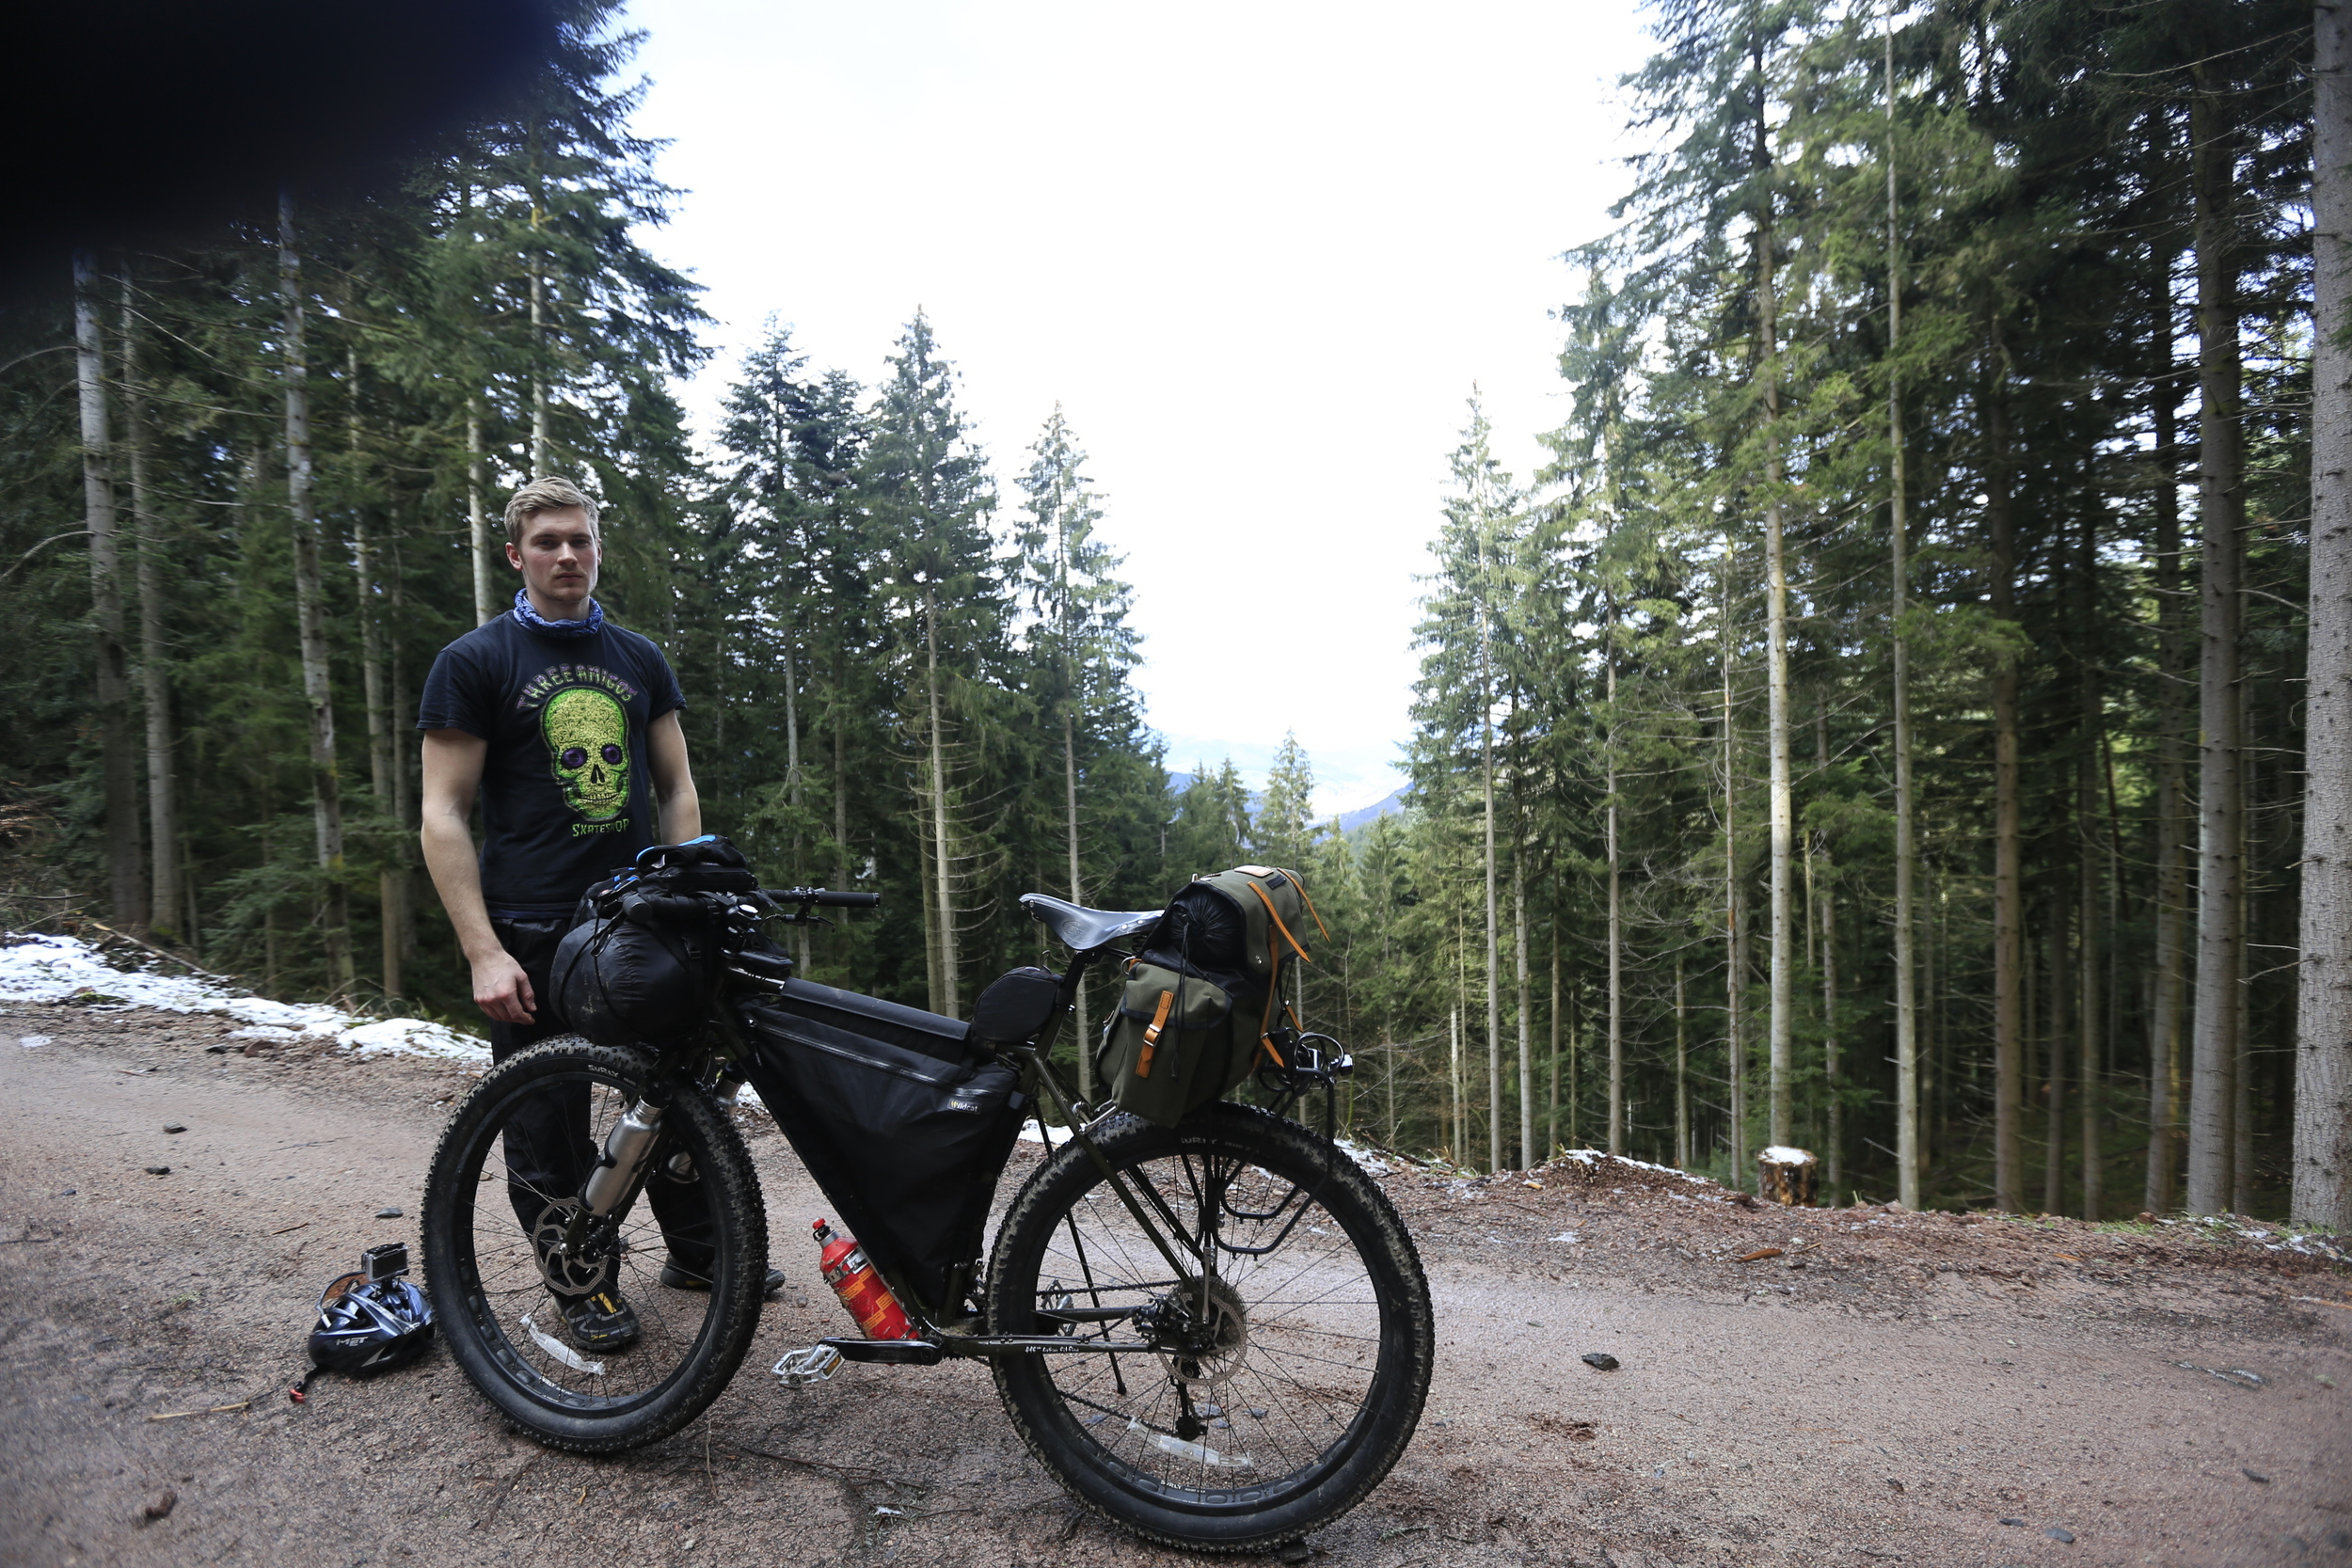 black forest germany, black forest bikepacking, bikepacking blog, surly, surly ecr, surly blog, photography blog, revelate designs, klean kanteen, wildcat gear